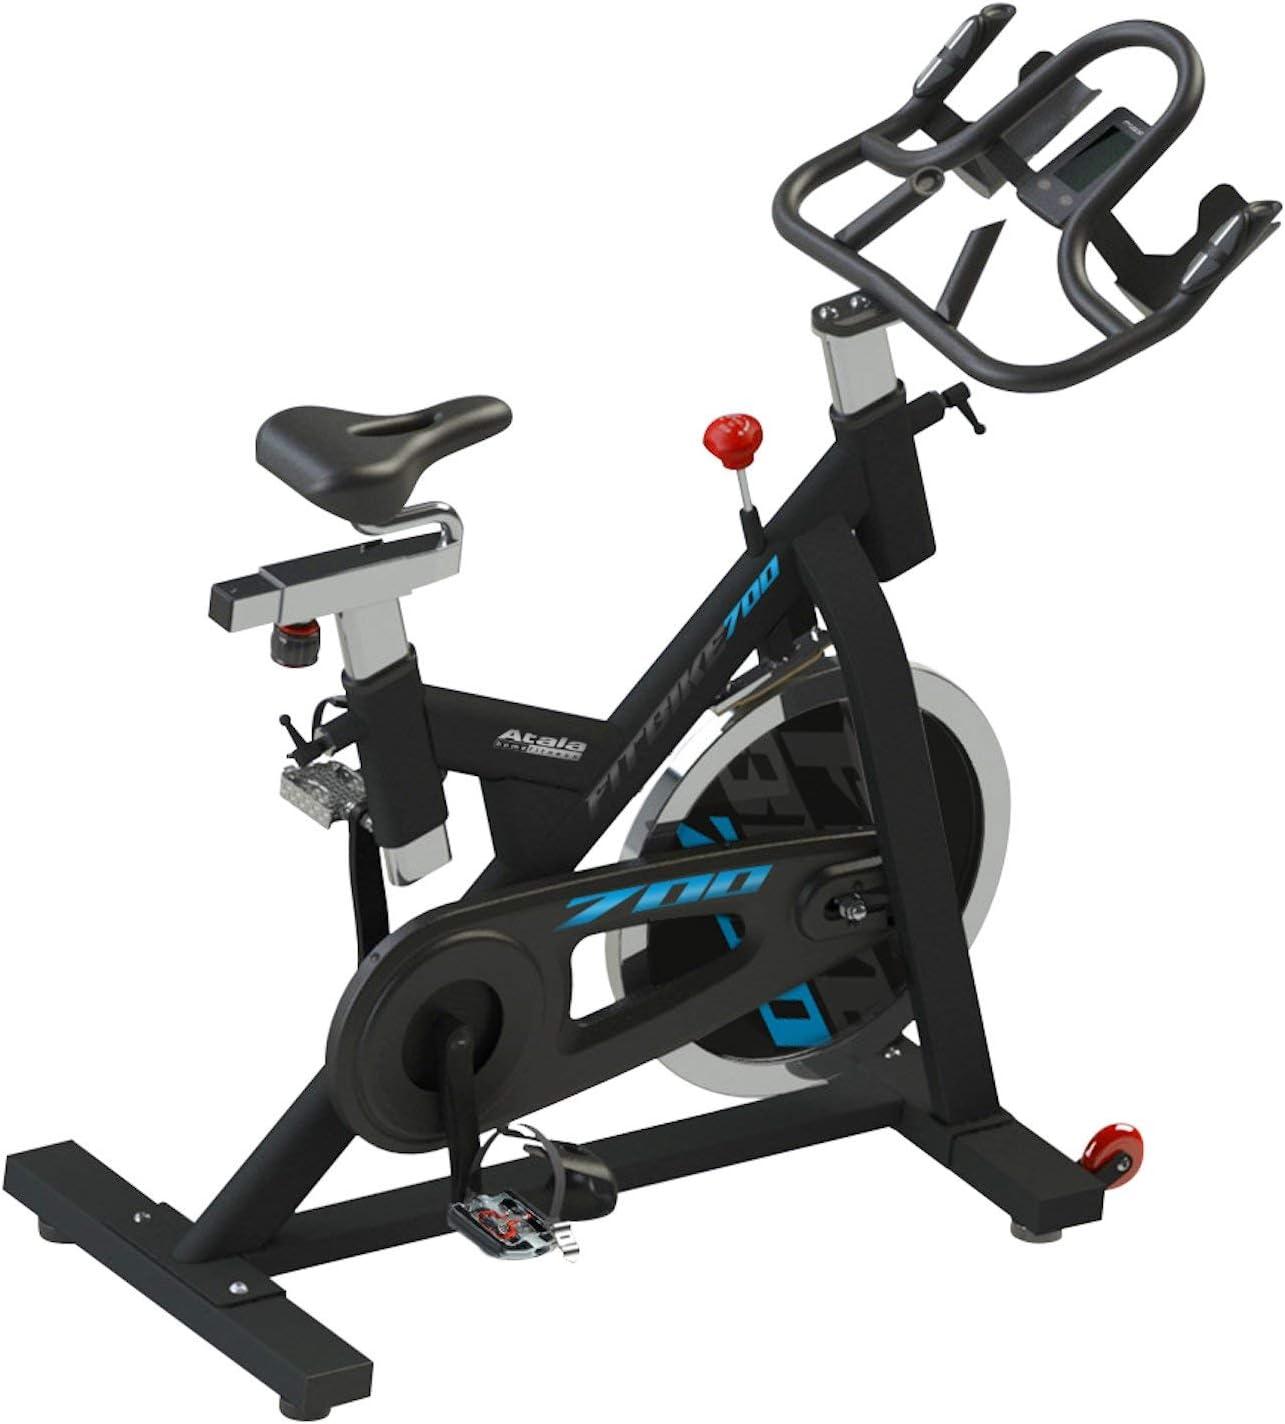 ATAL Spin Bike Fit Bike 700 Home Fitness 2019 - Bicicleta estática: Amazon.es: Deportes y aire libre